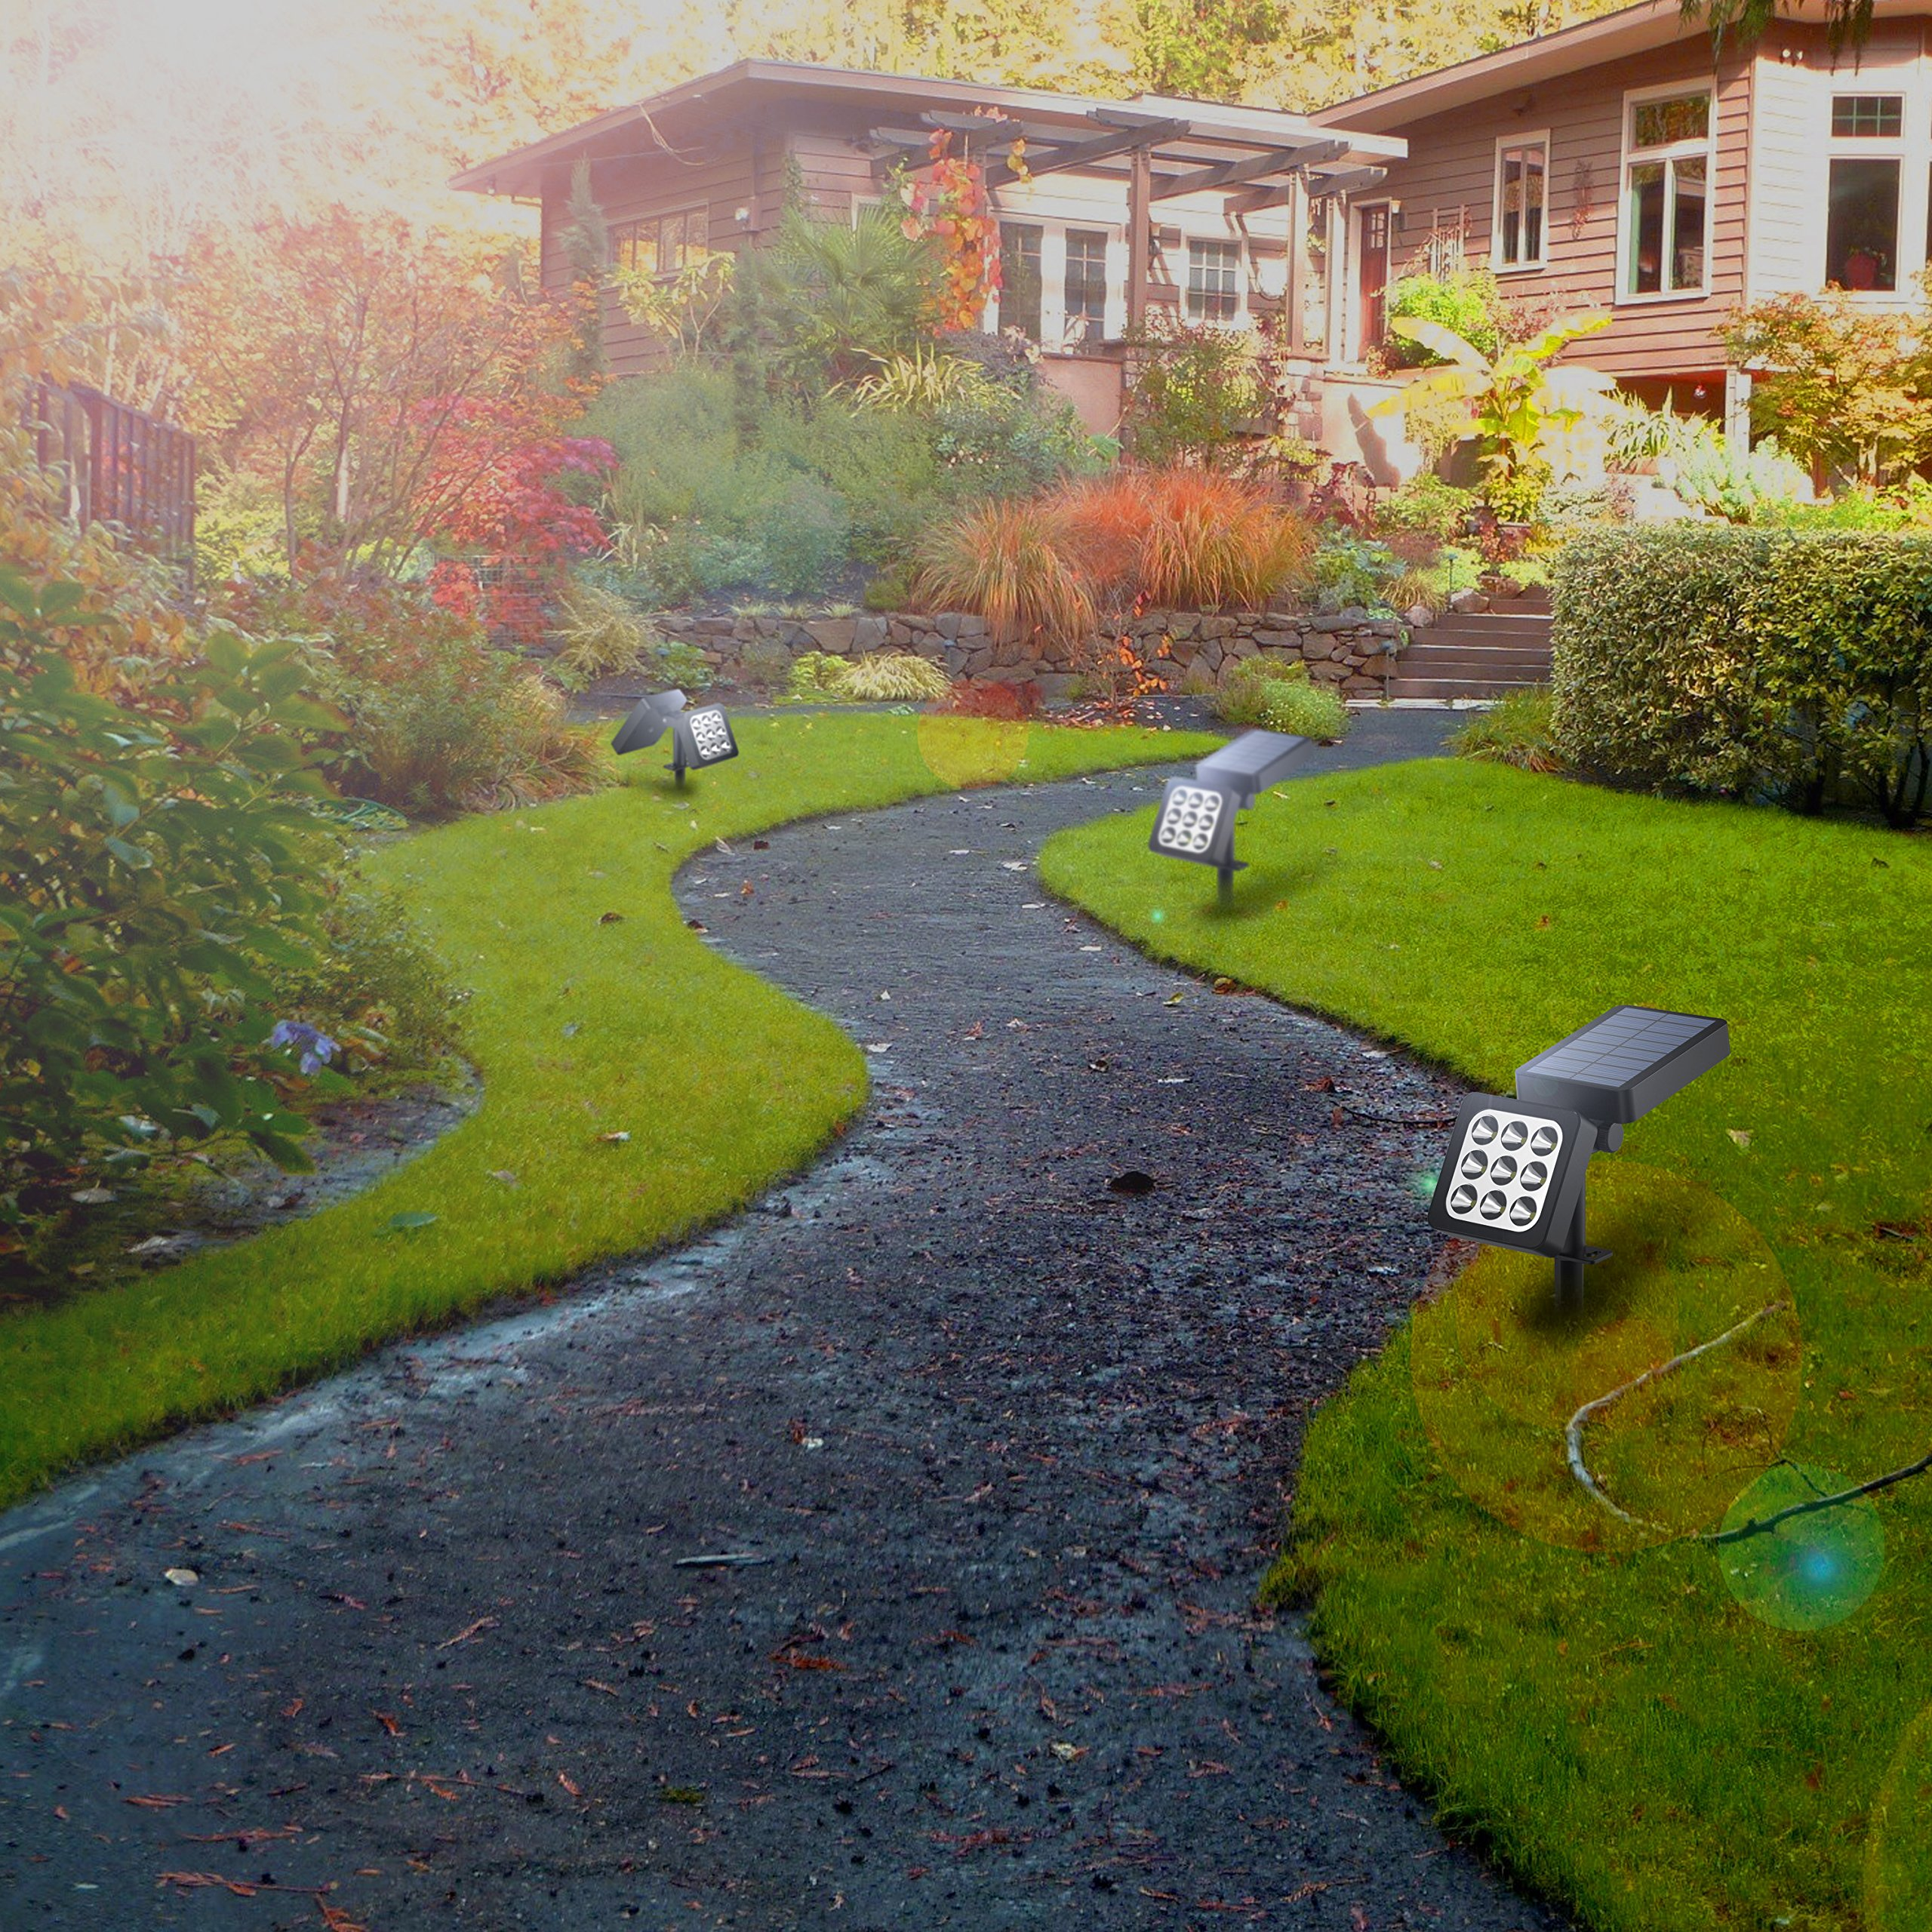 solar spotlights 2 in 1 waterproof outdoor landscape lighting 9 led